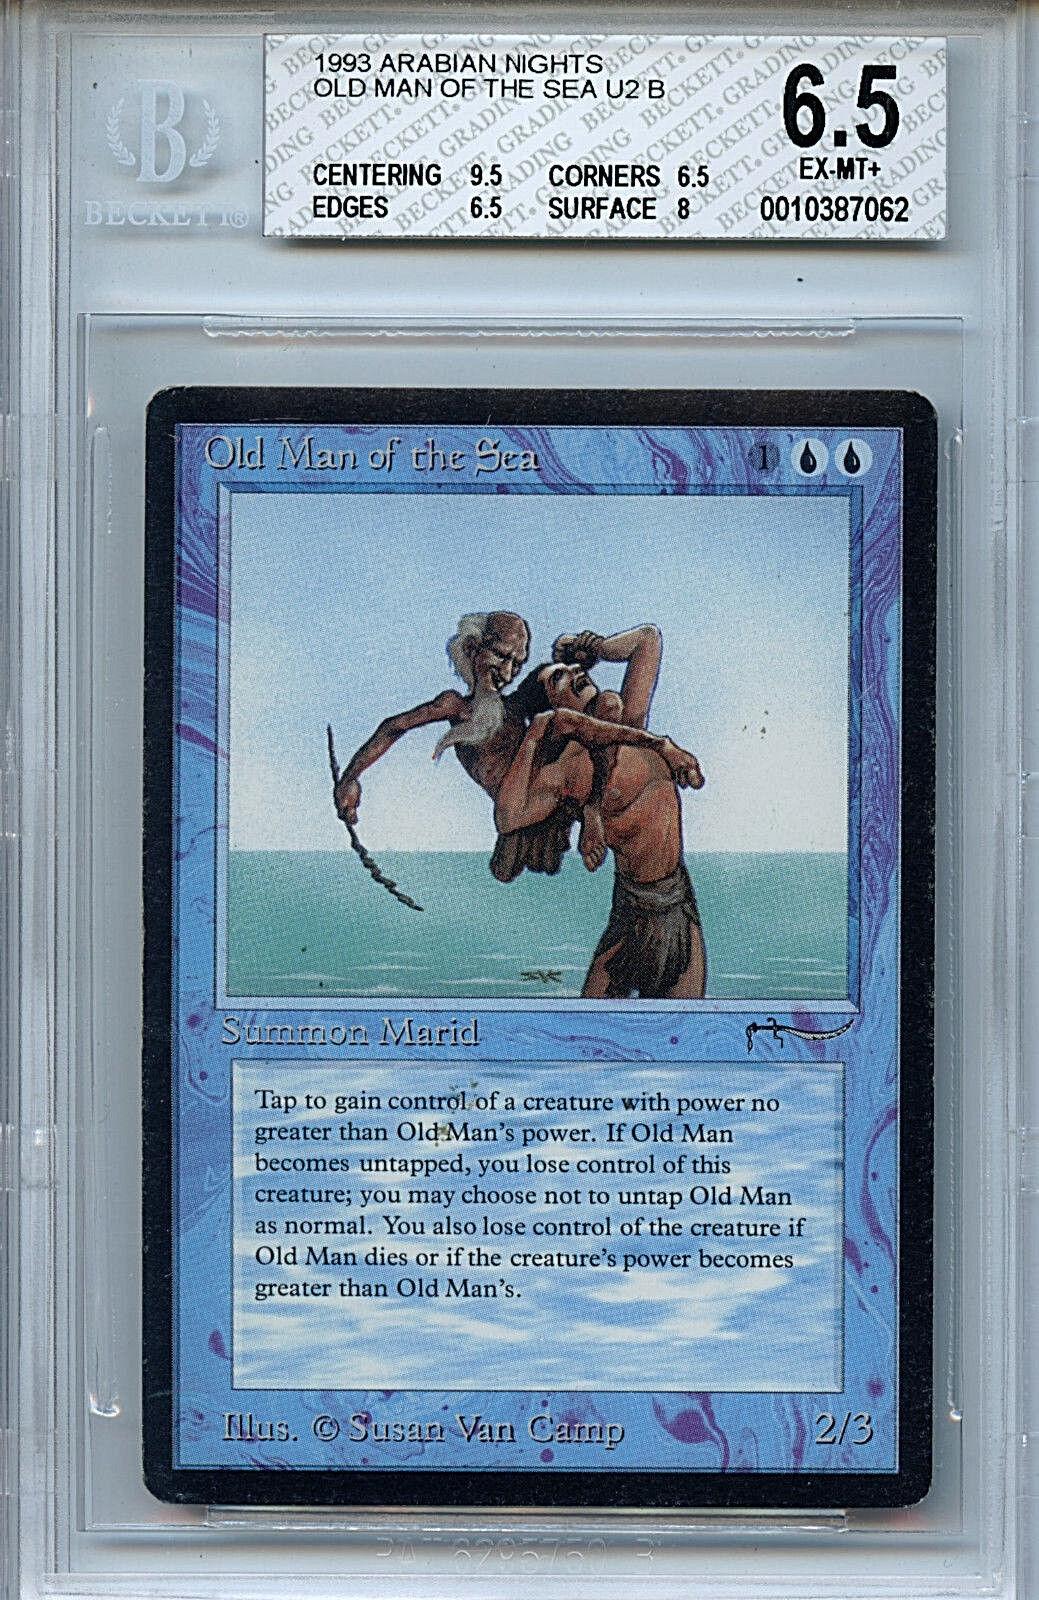 MTG Arabian Nights Old Man of the Sea BGS 6.5 Ex MINT+ 9.5 Centering 7062